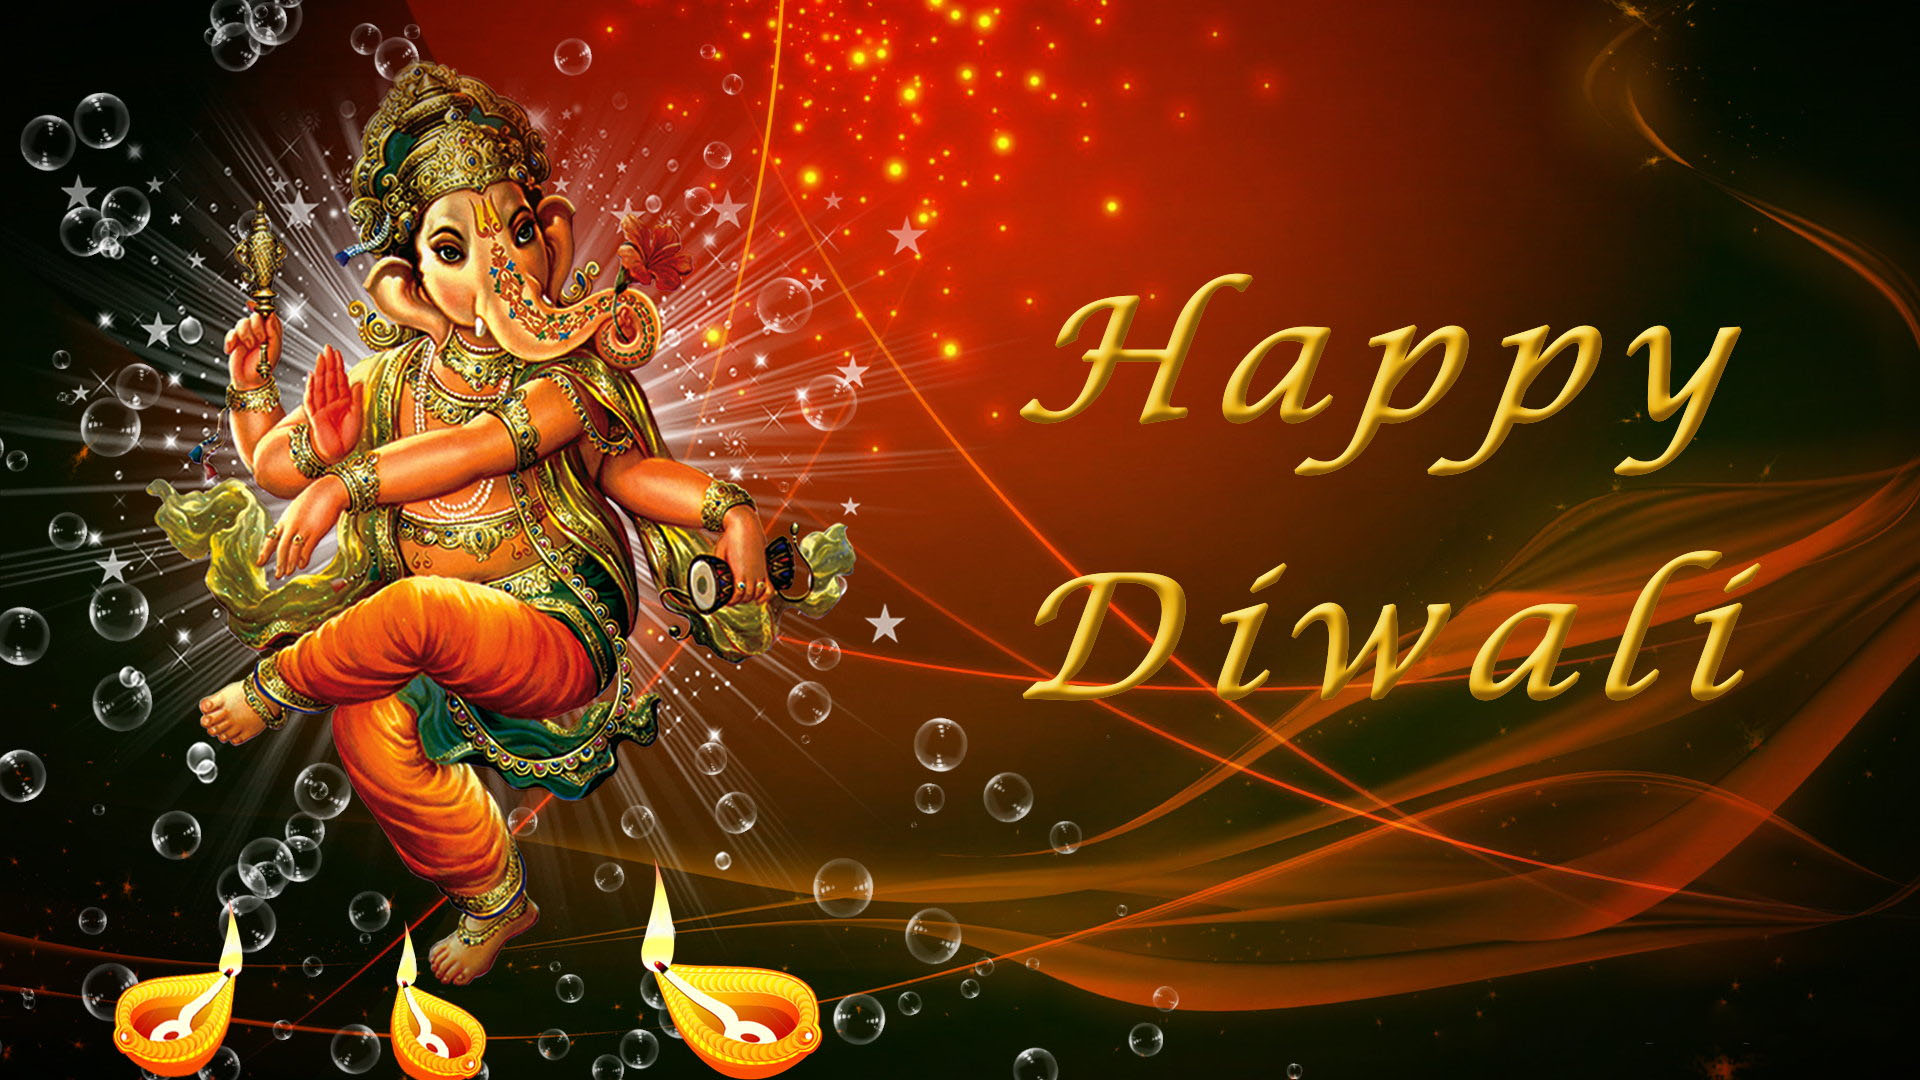 Ganesh Diwali Hd Image For Desktop